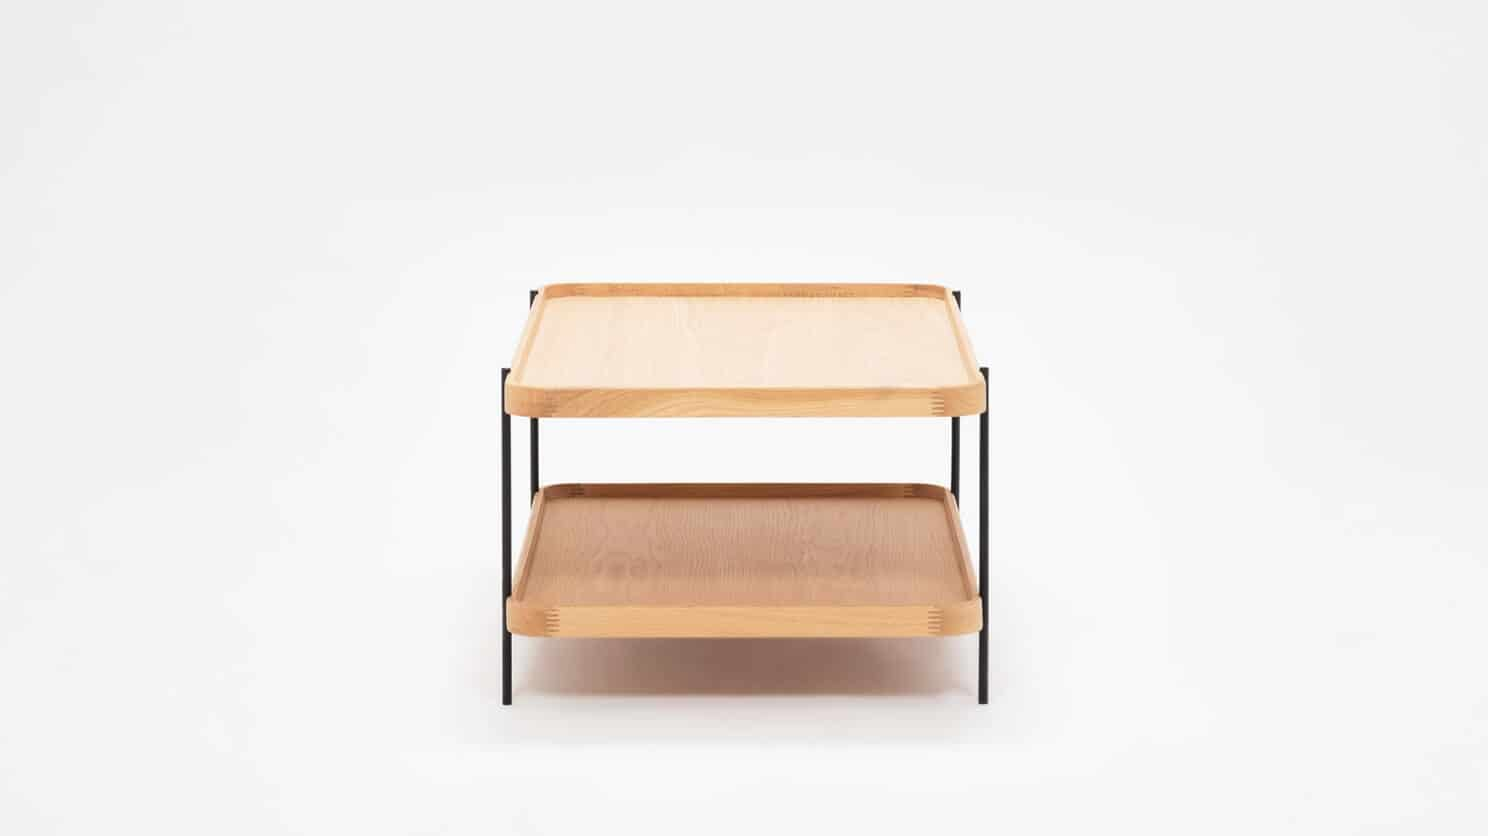 3020 419 16 4 coffee tables sage rectangular coffee table oak side 01